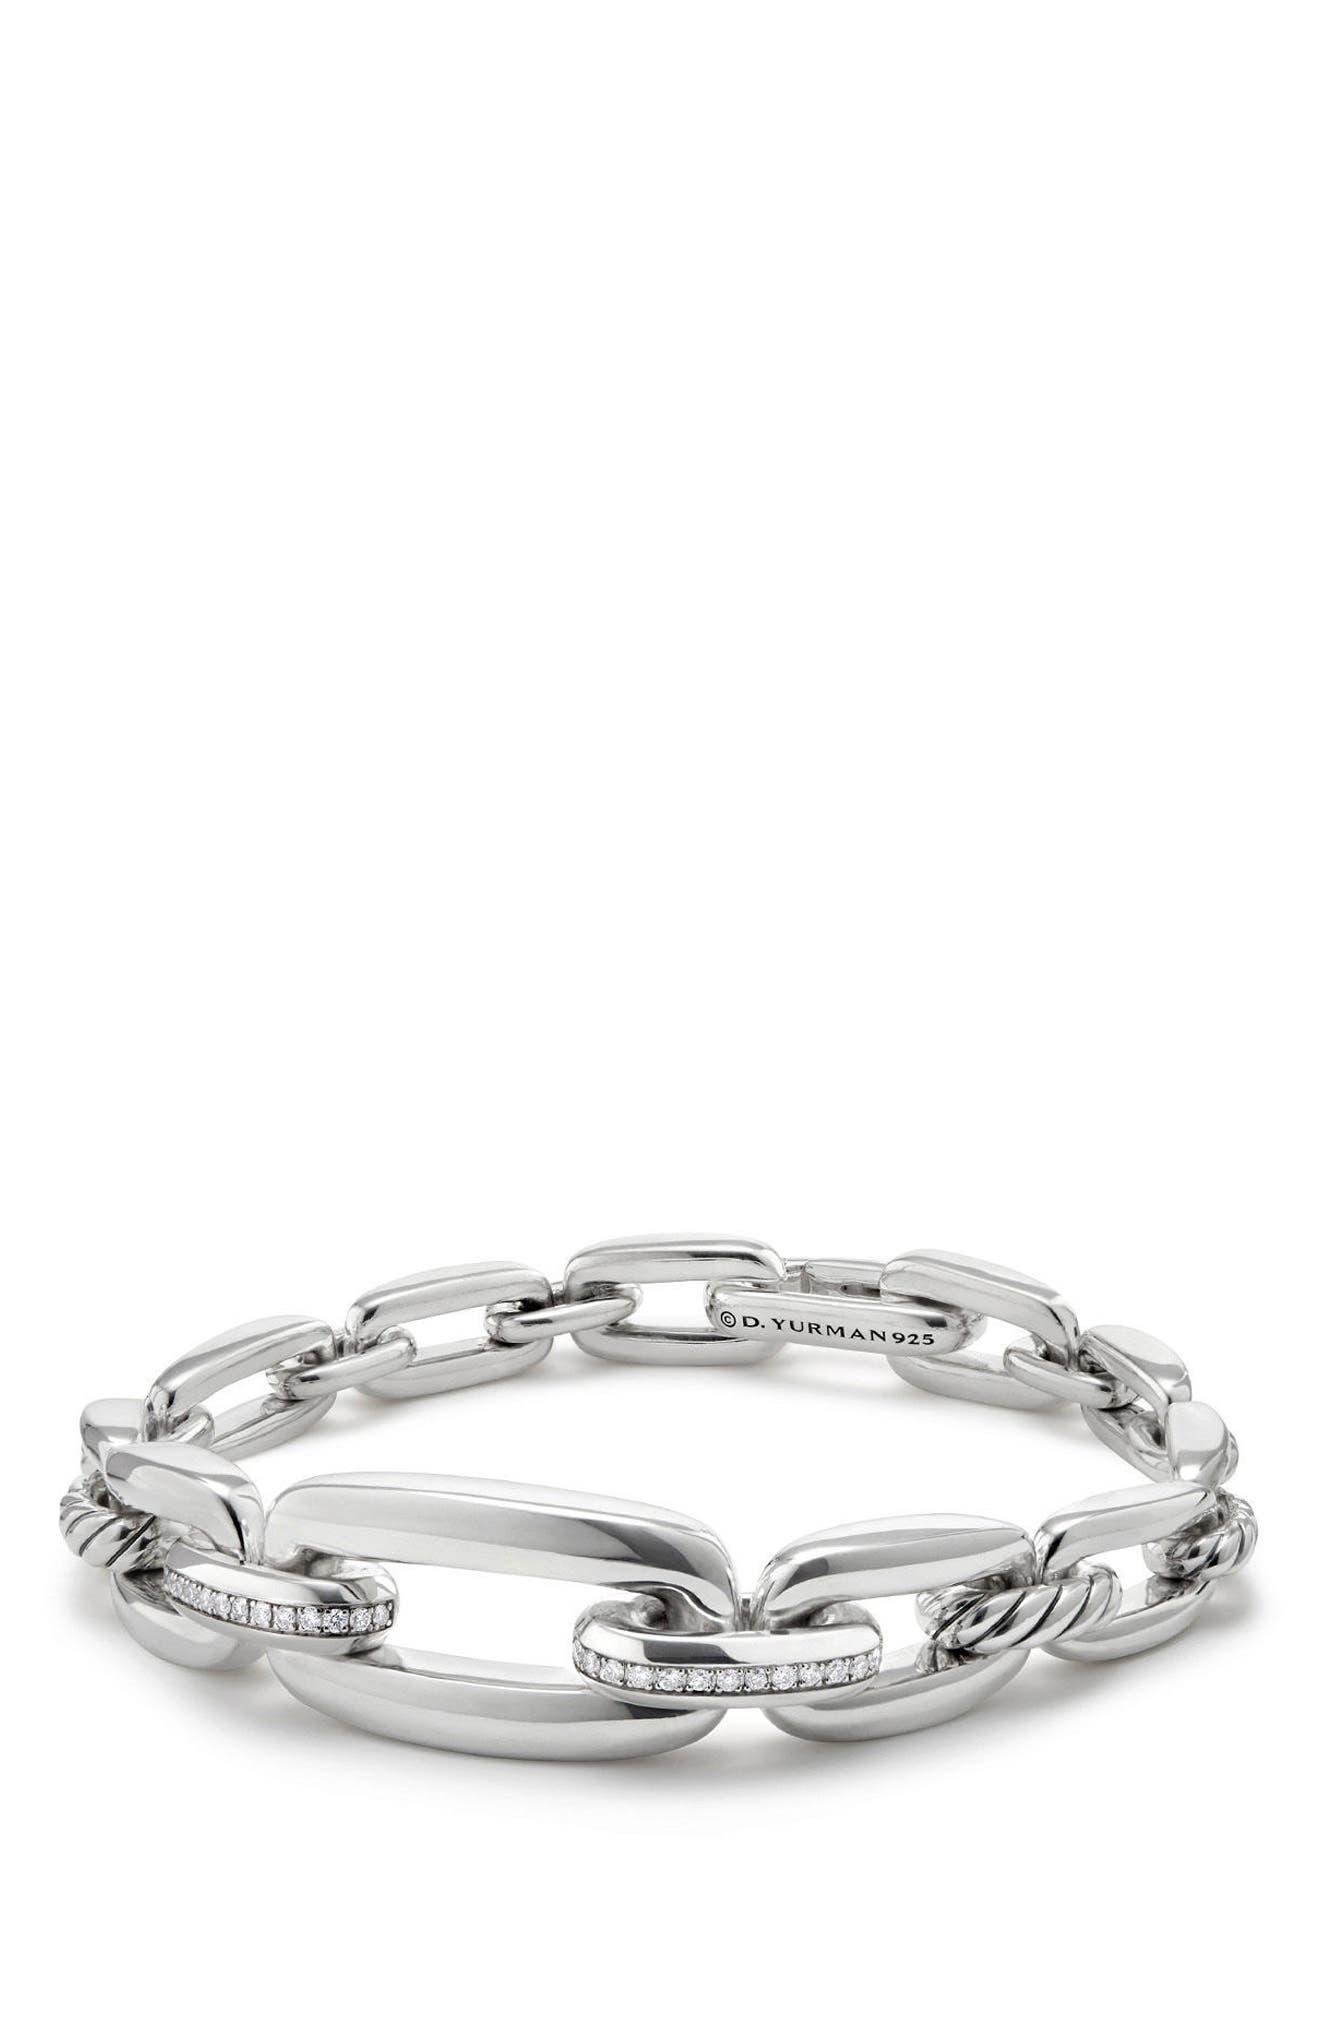 Main Image - David Yurman Wellesley Chain Link Bracelet with Diamonds